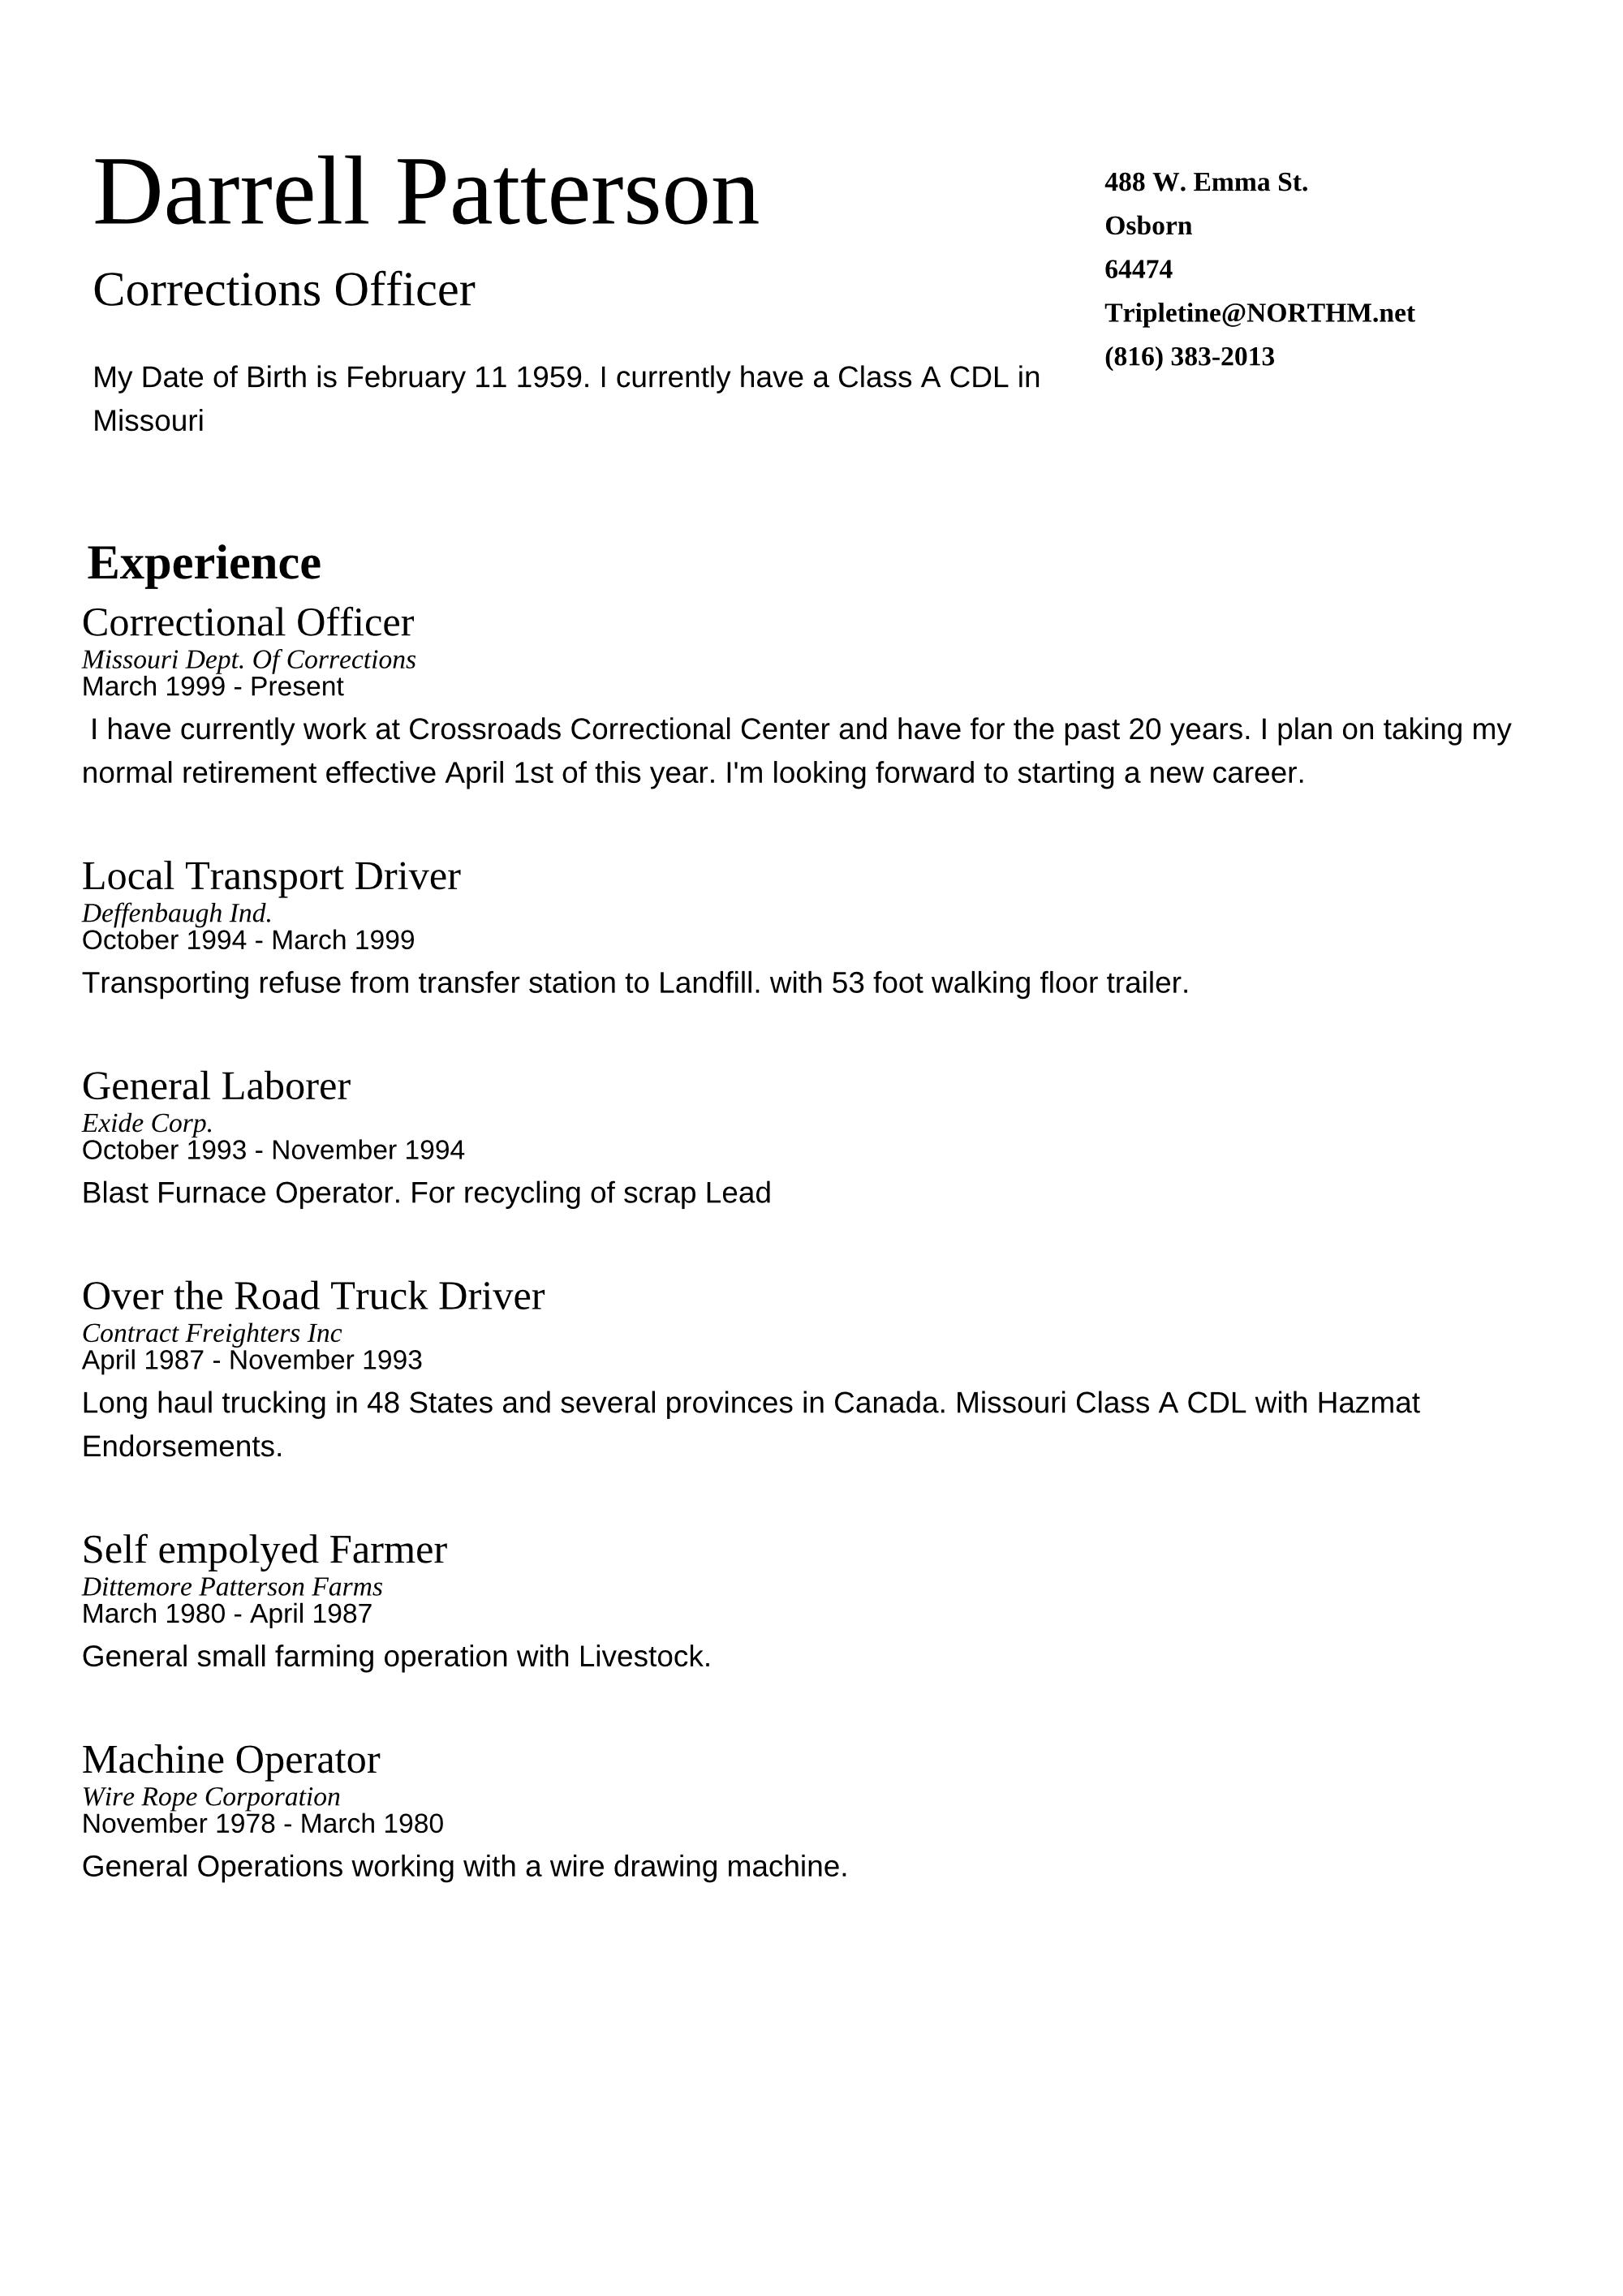 Resume App Resume, App, Resume builder